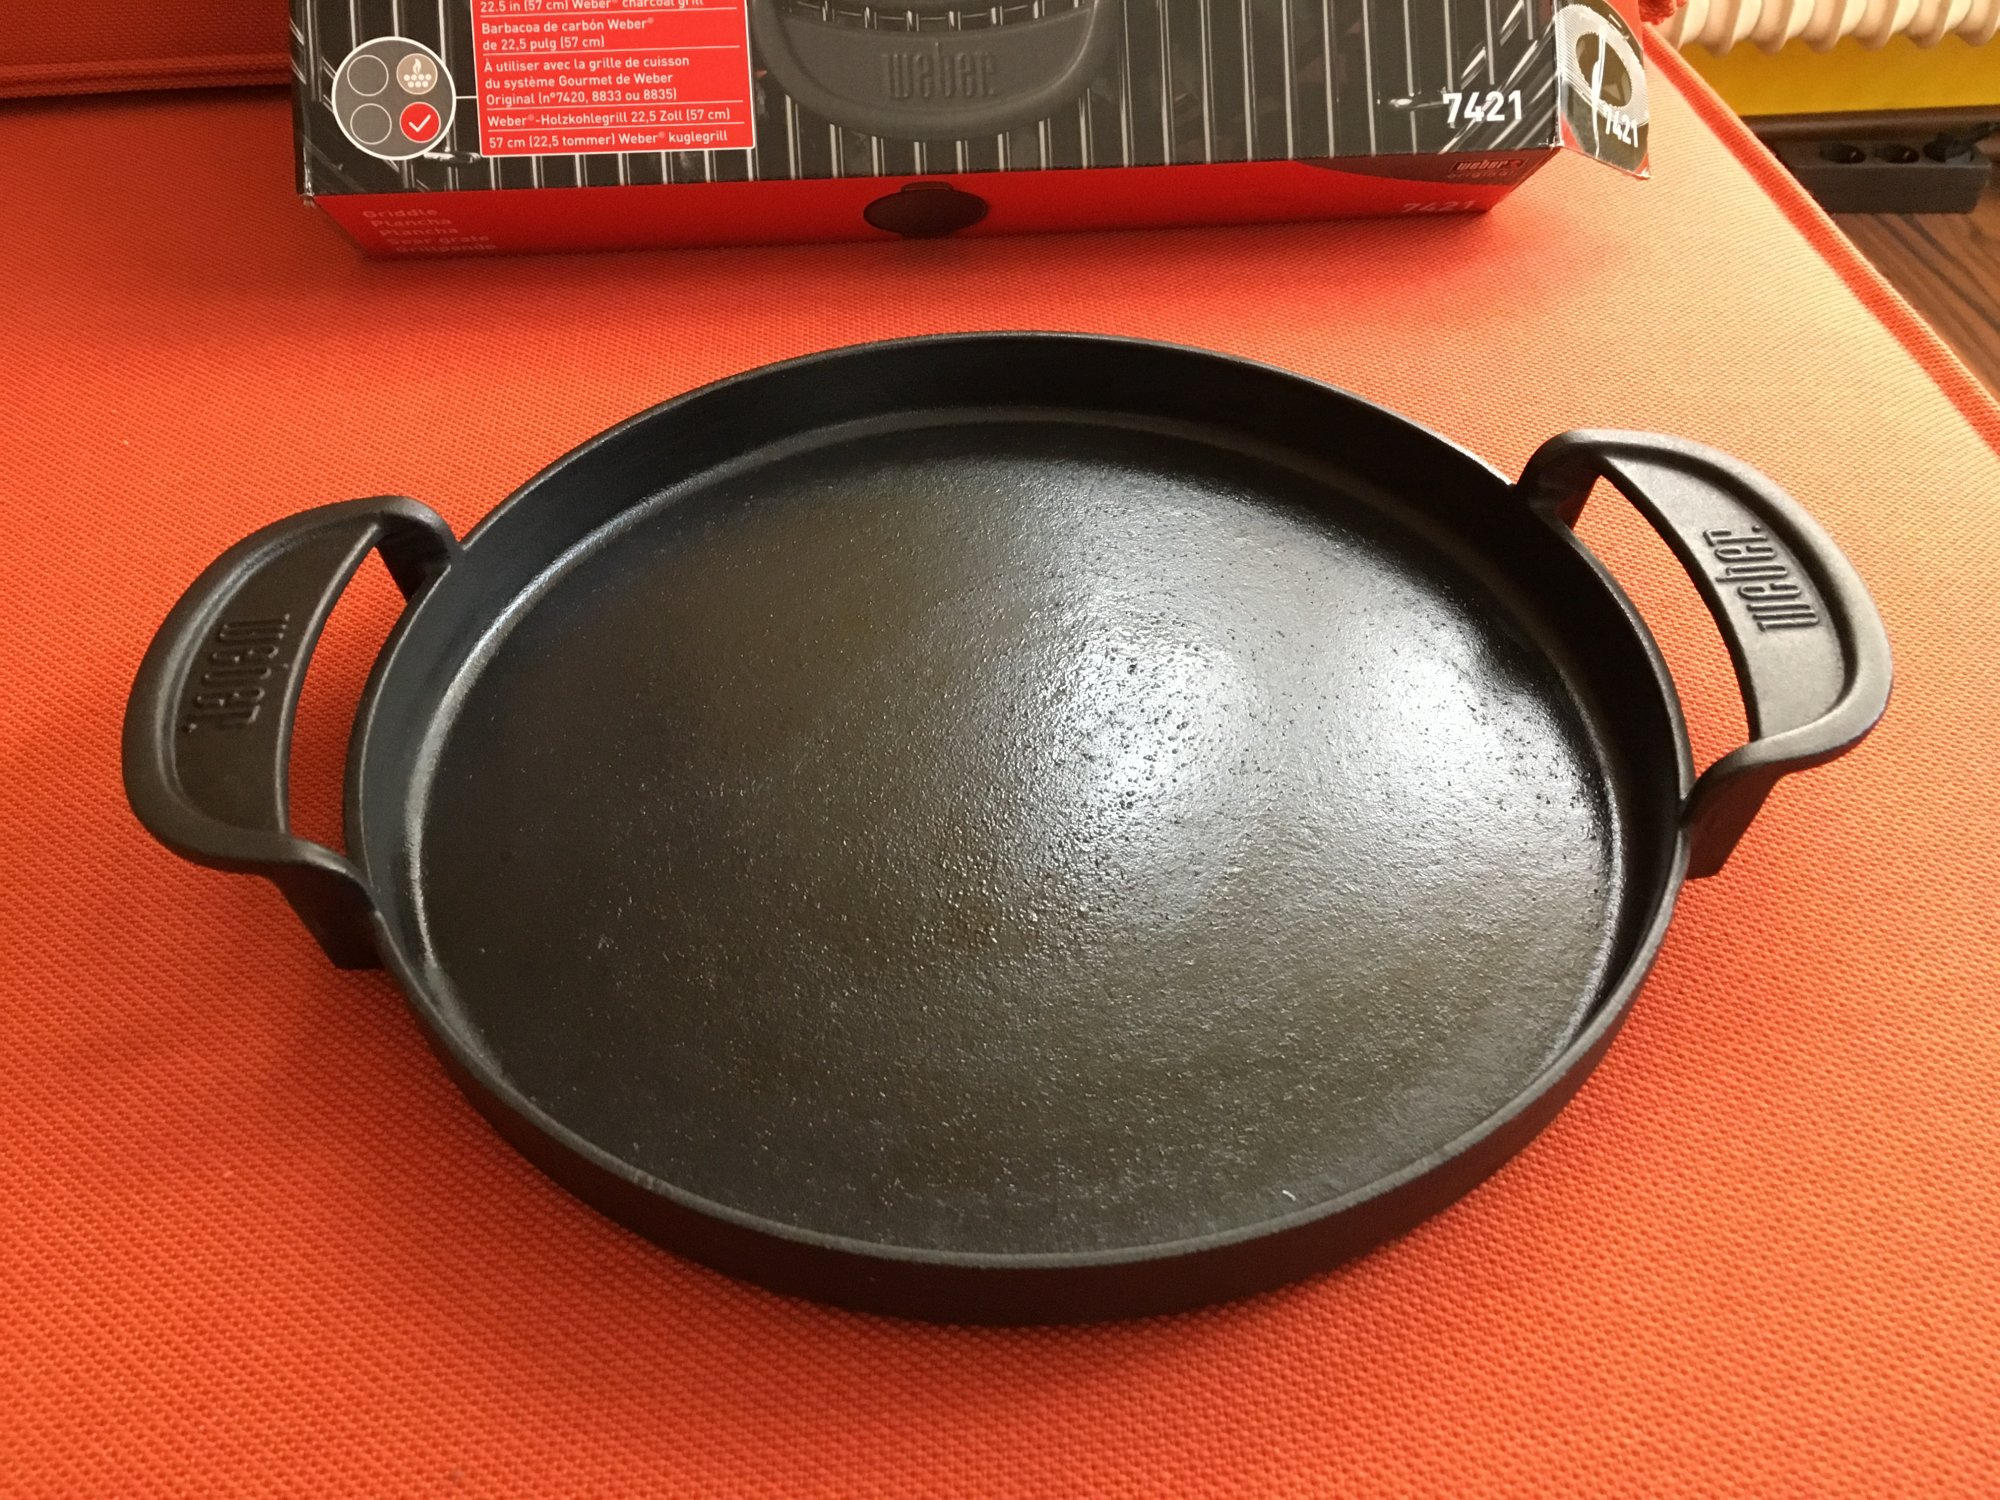 Weber Holzkohlegrill Idealo : Verkaufe weber grill pfanne gbs system grillforum